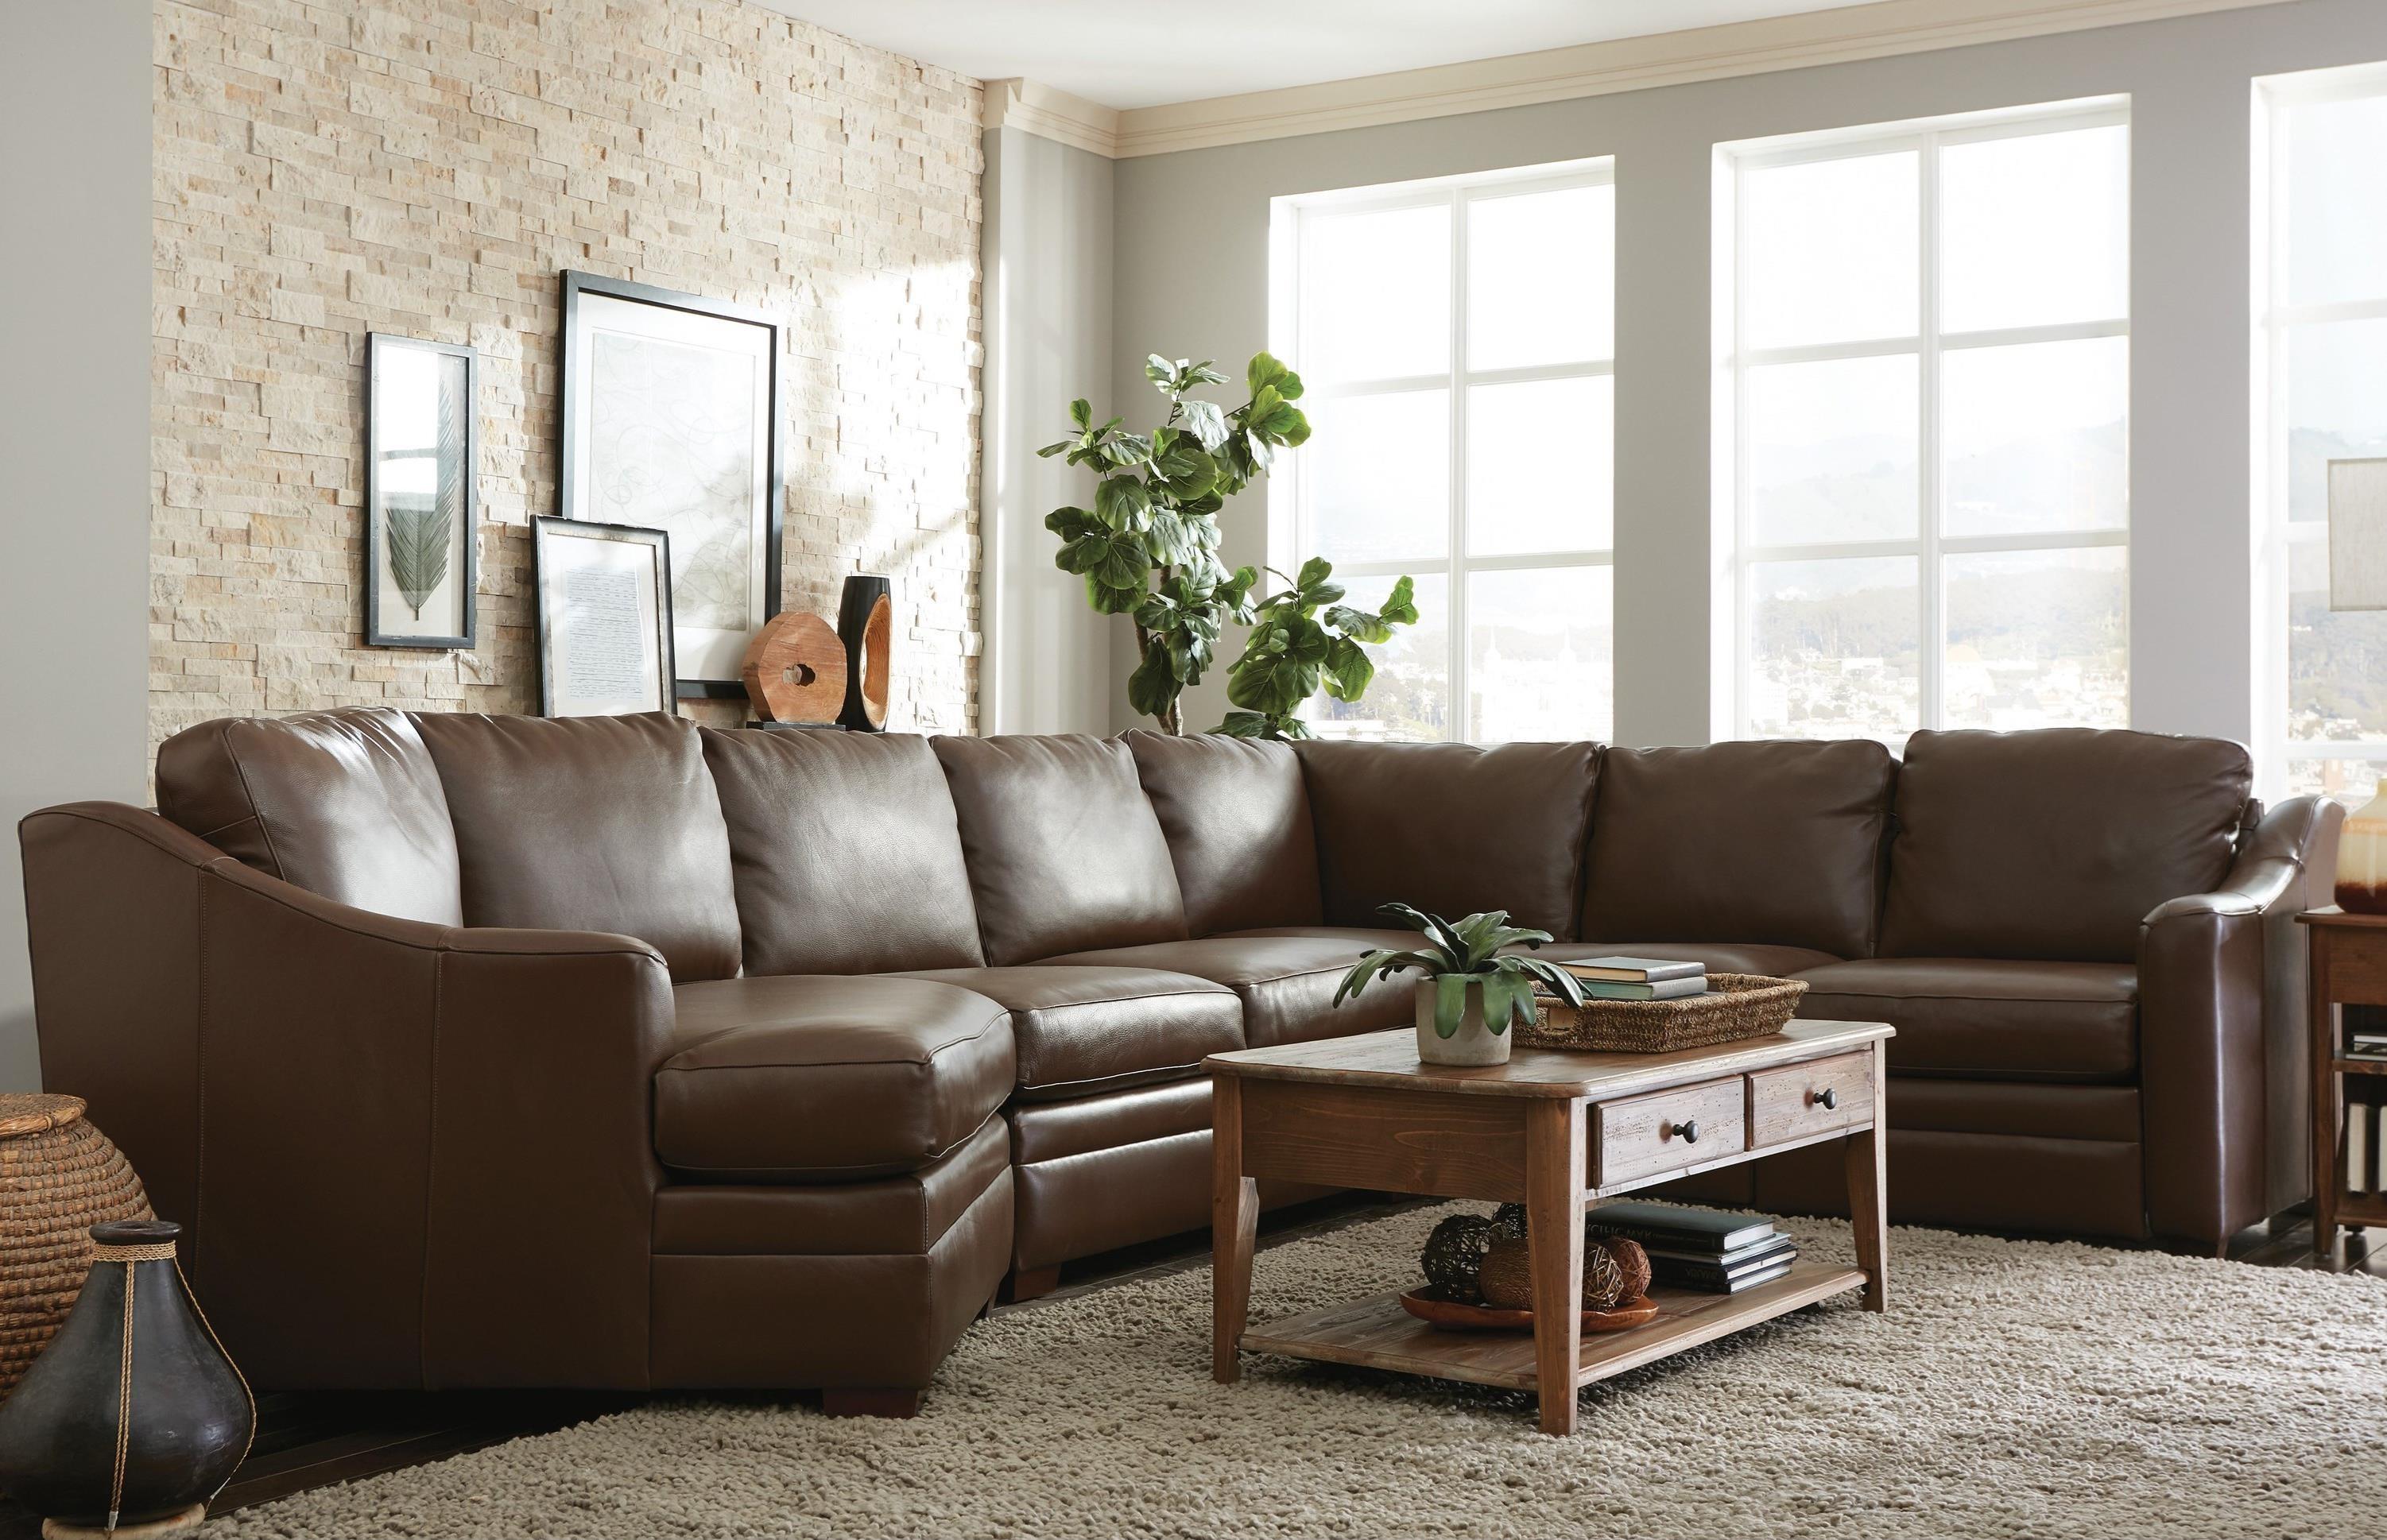 Craftmaster L9 Custom   Design Options3 Pc Sectional Sofa W/ Power Recliner  ...